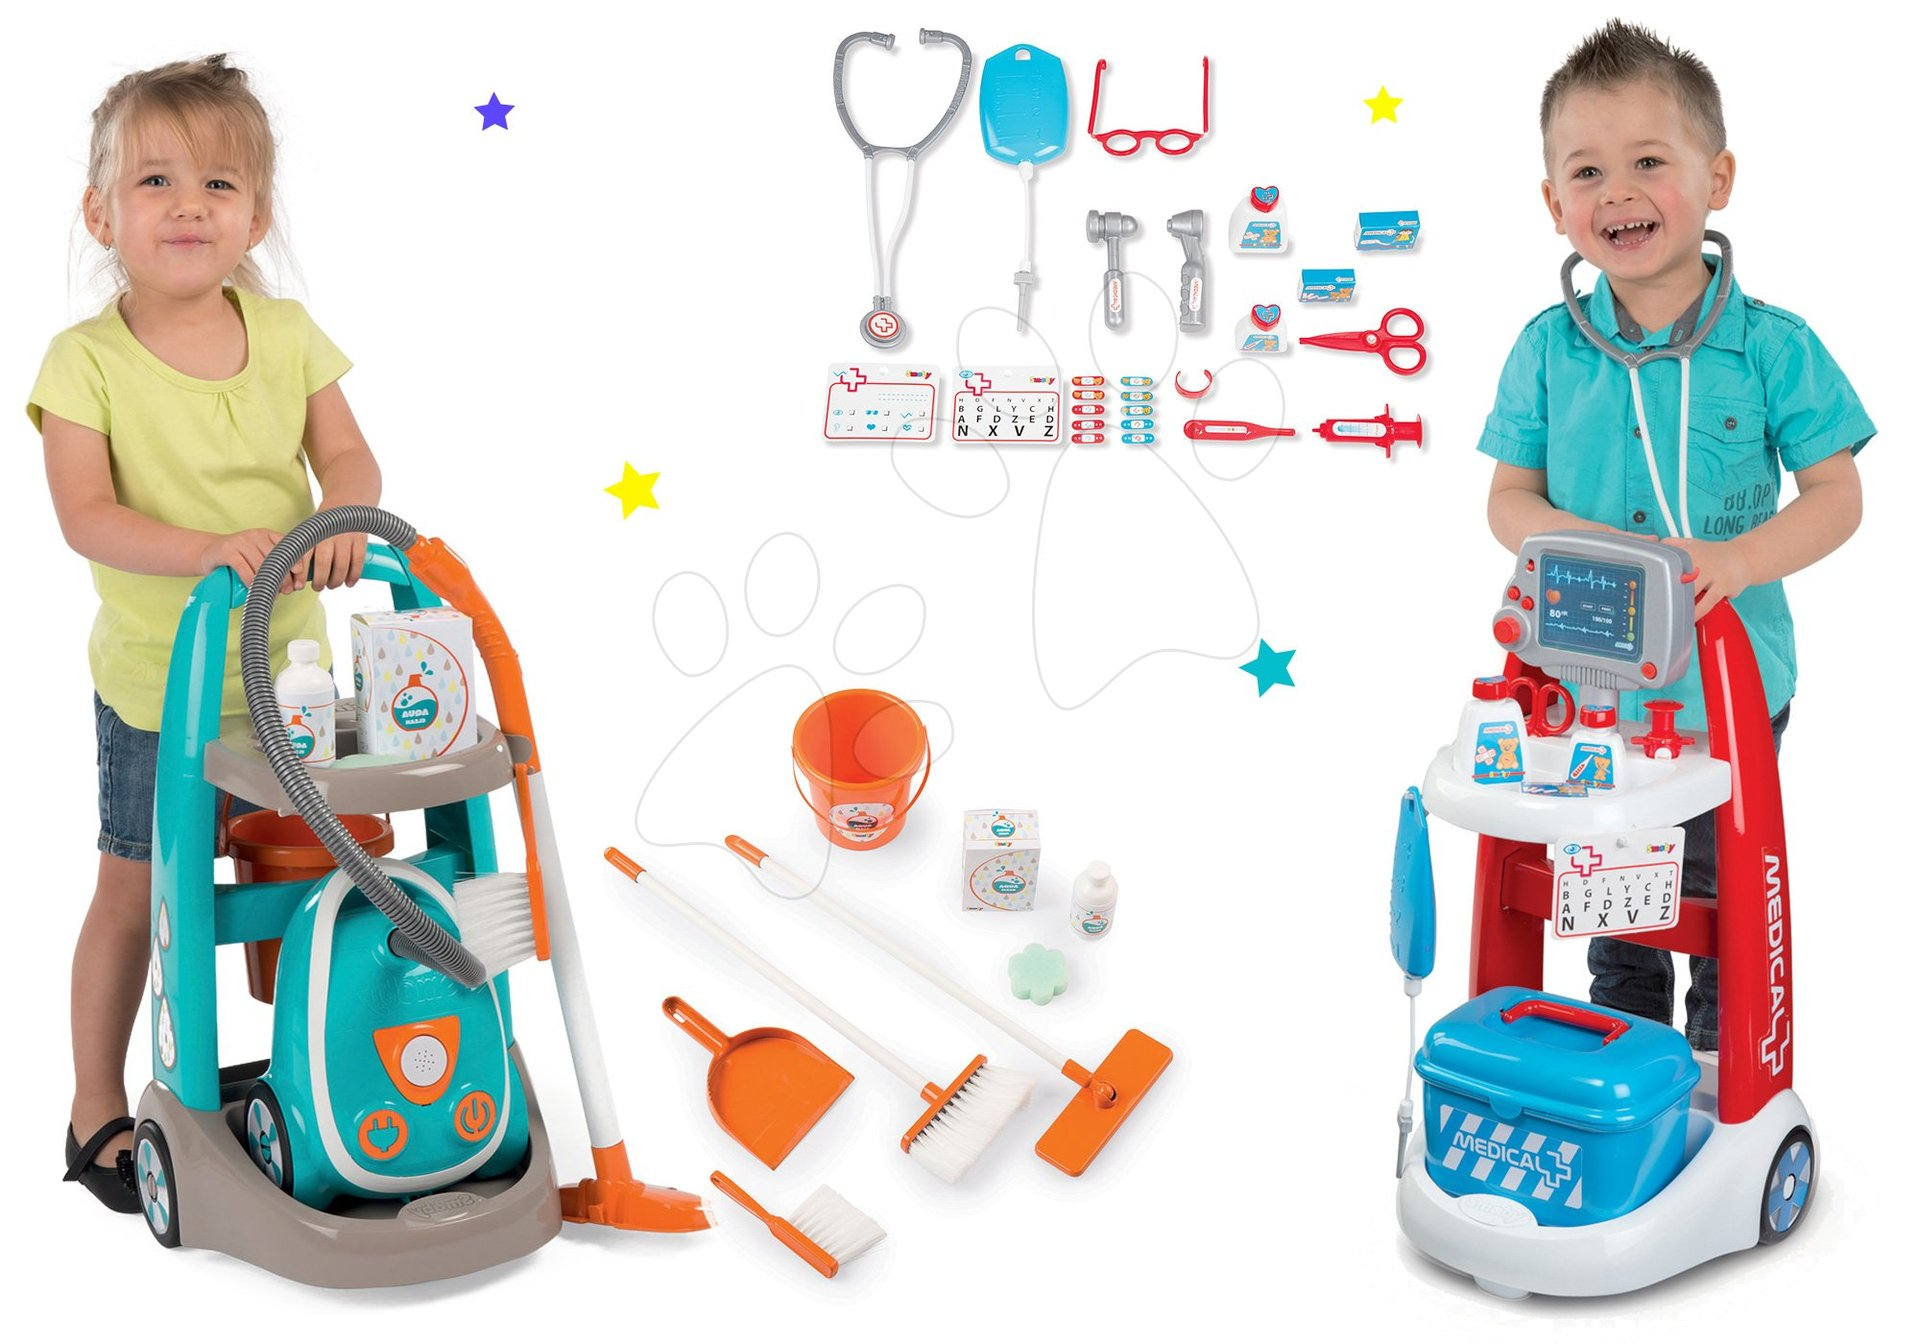 Smoby set upratovací vozík s elektronickým vysávačom a lekársky vozík s kufríkom 330309-14